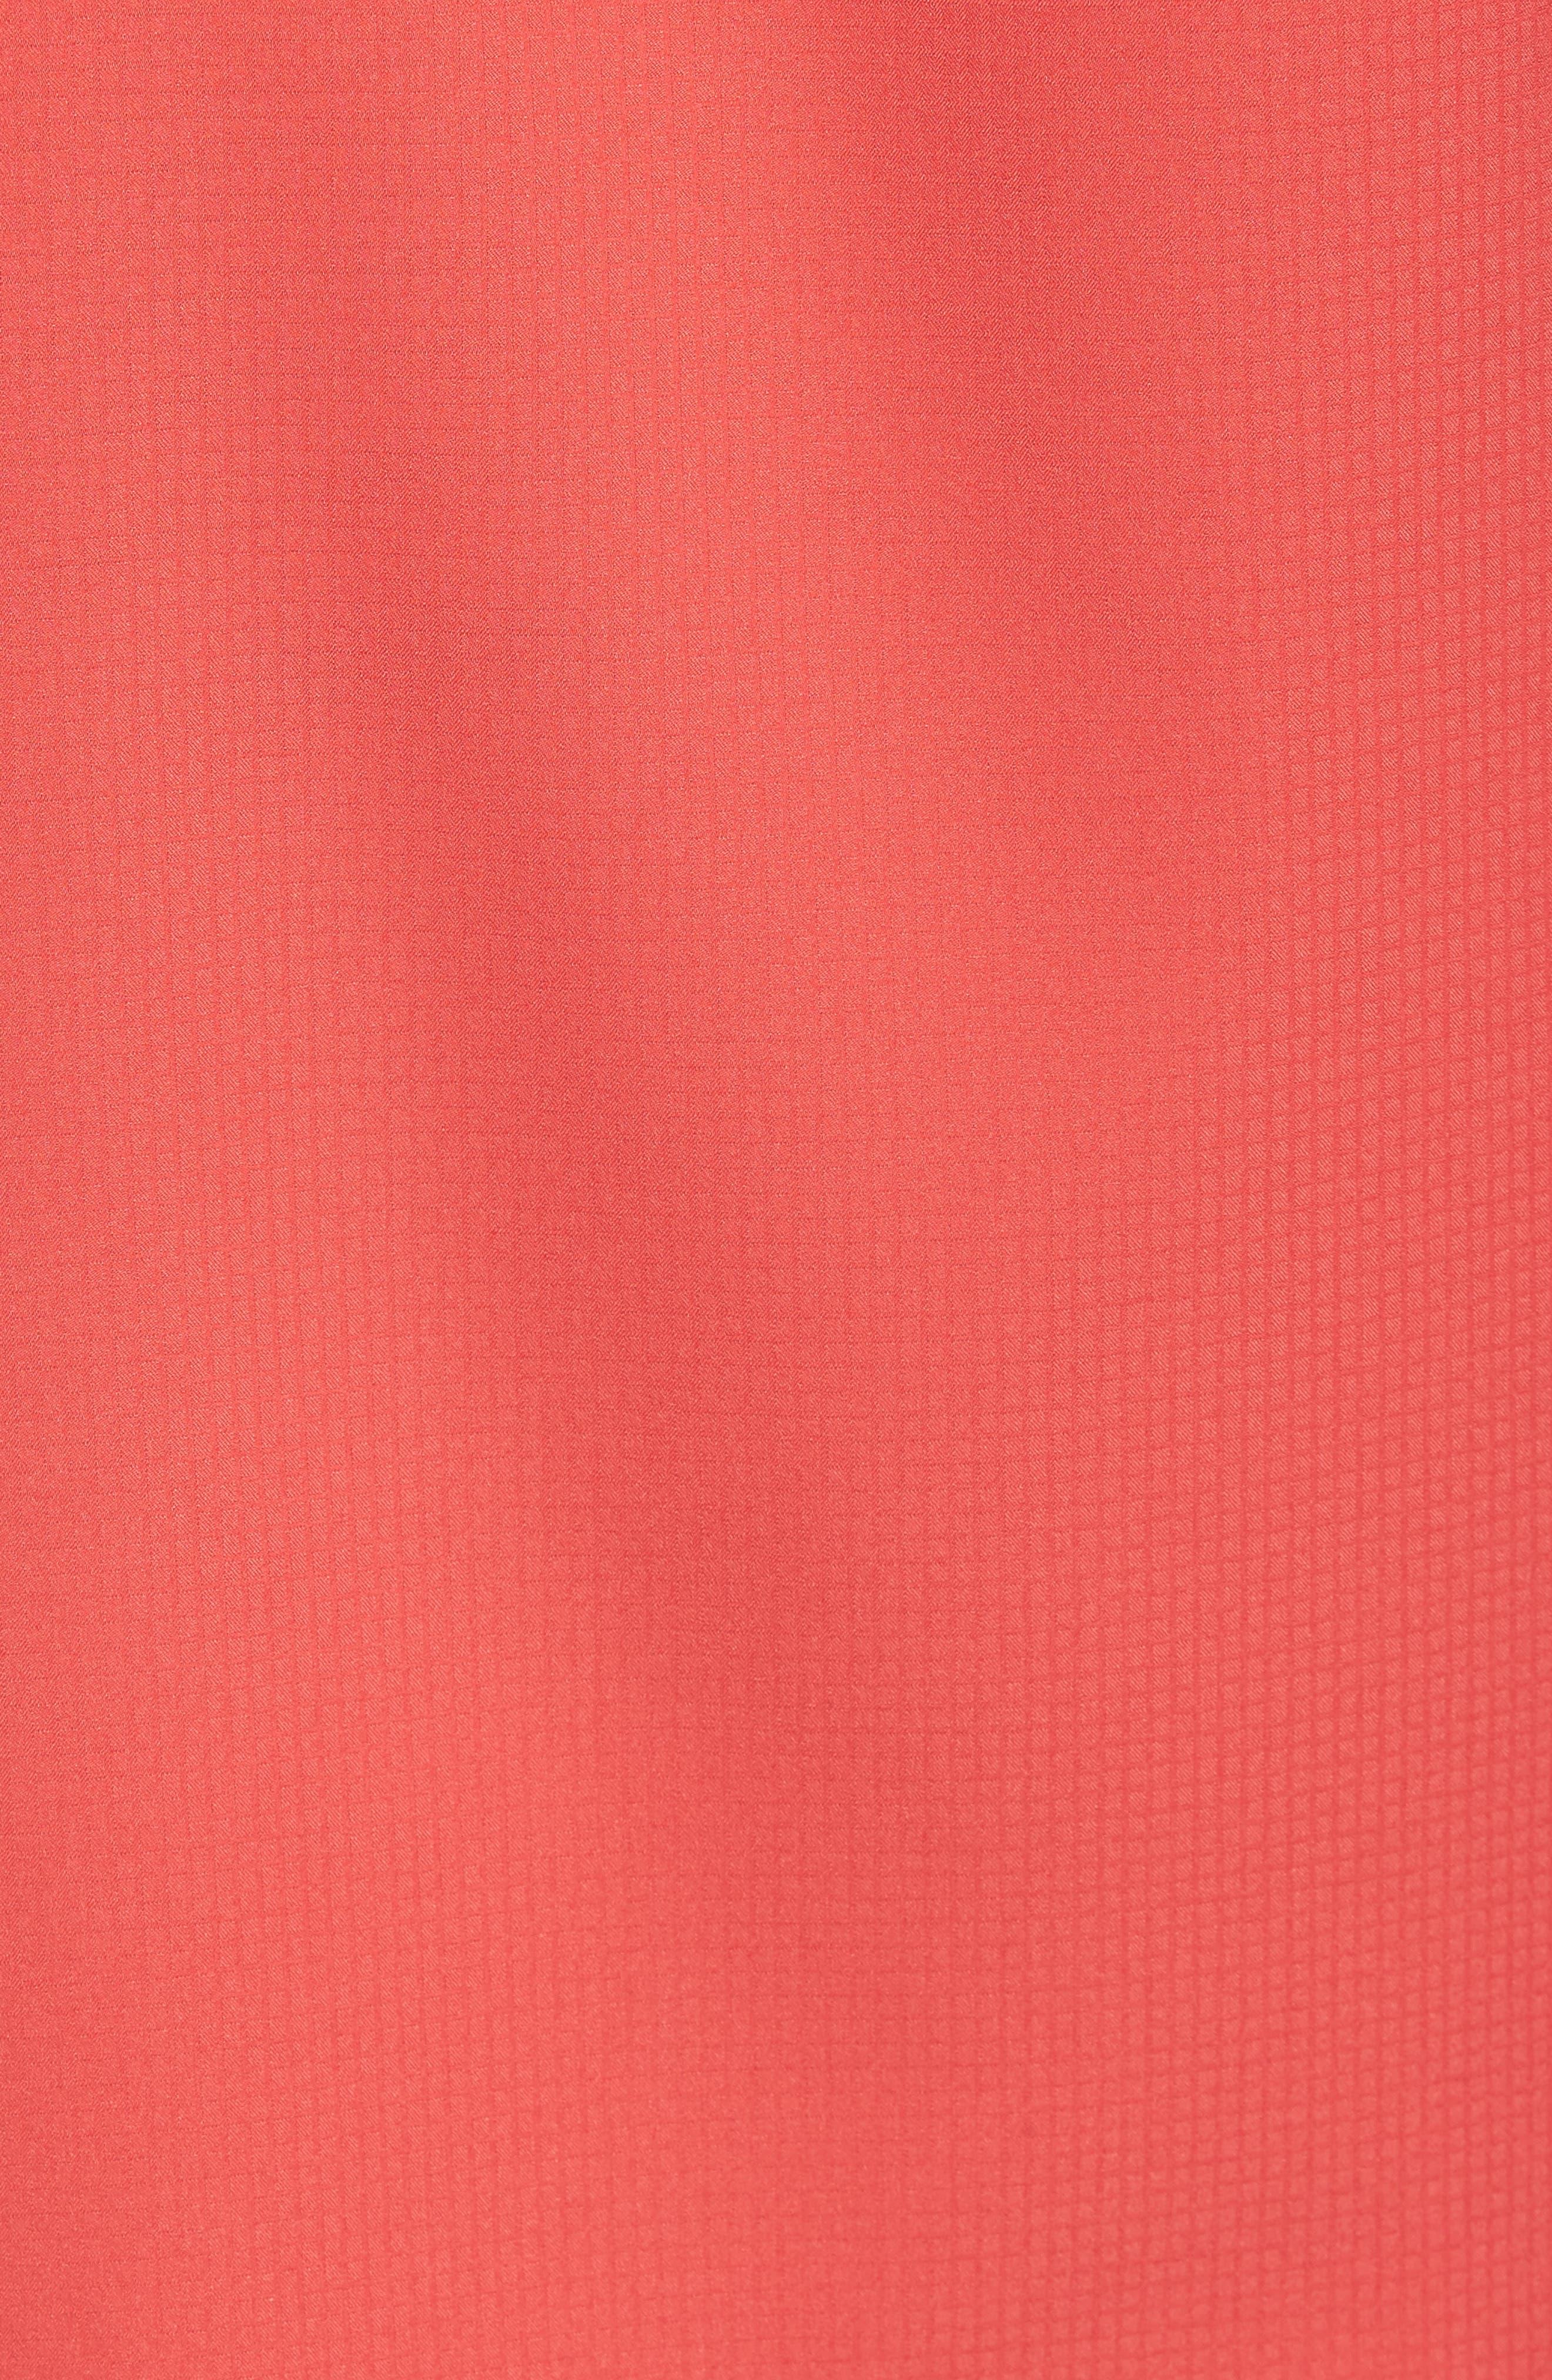 PFG Low Drag Offshore Woven Shirt,                             Alternate thumbnail 24, color,